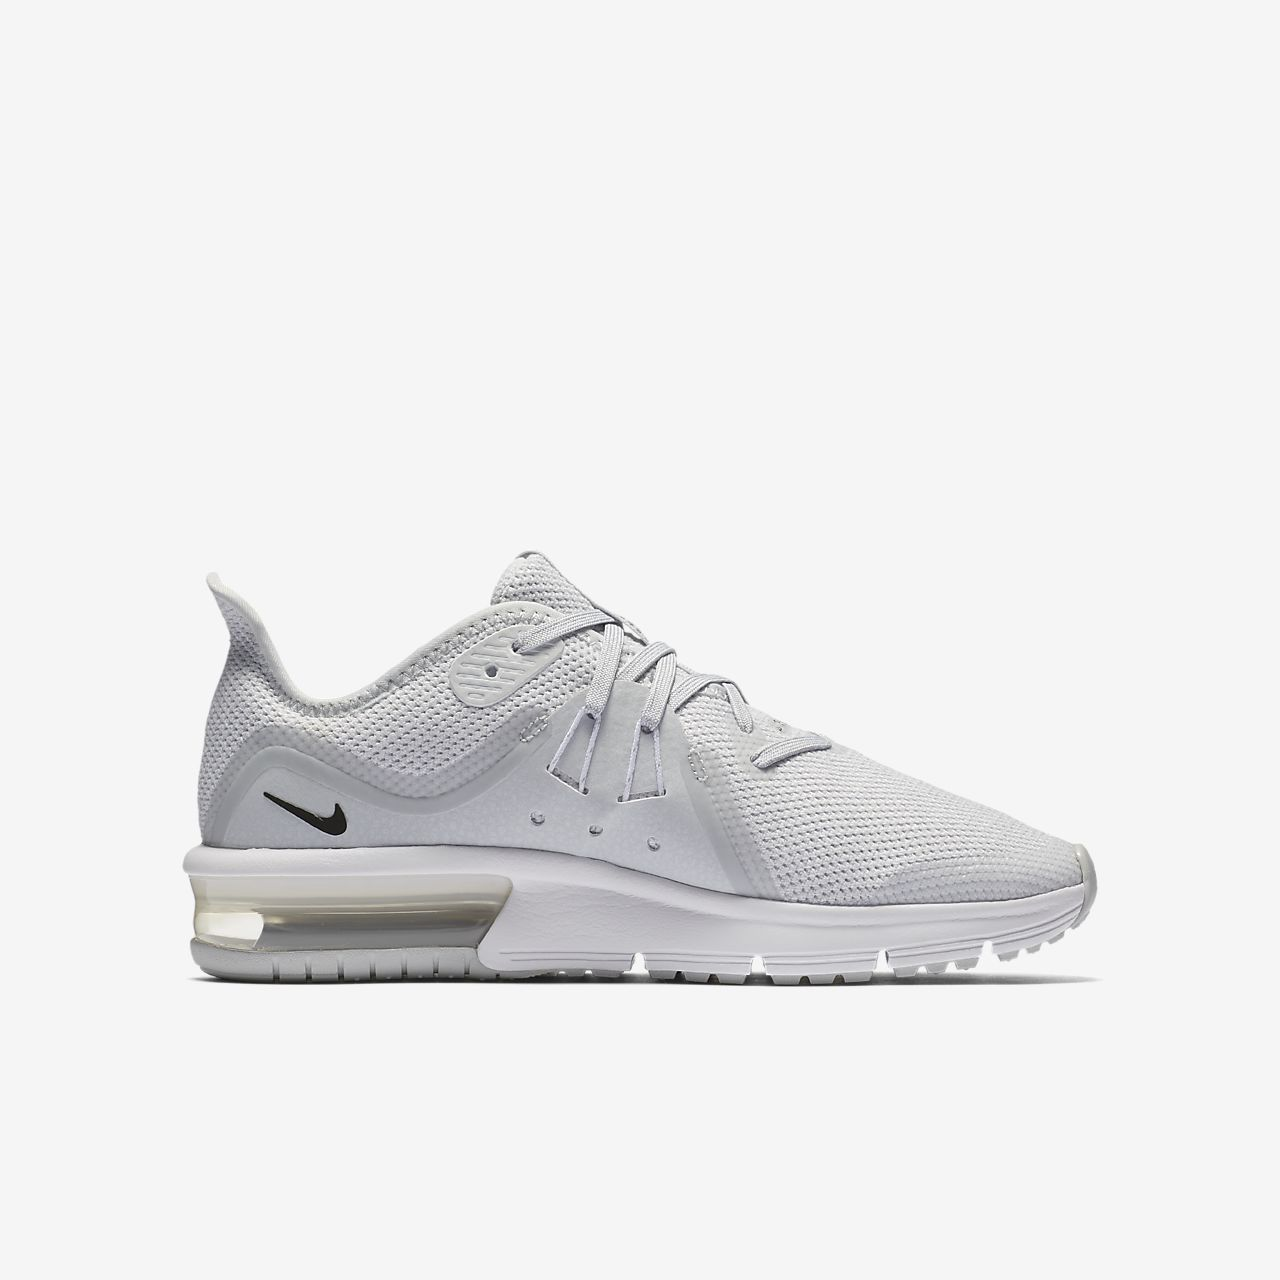 cheaper 429bd 433ff ... Nike Air Max Sequent 3 Older Kids  Shoe